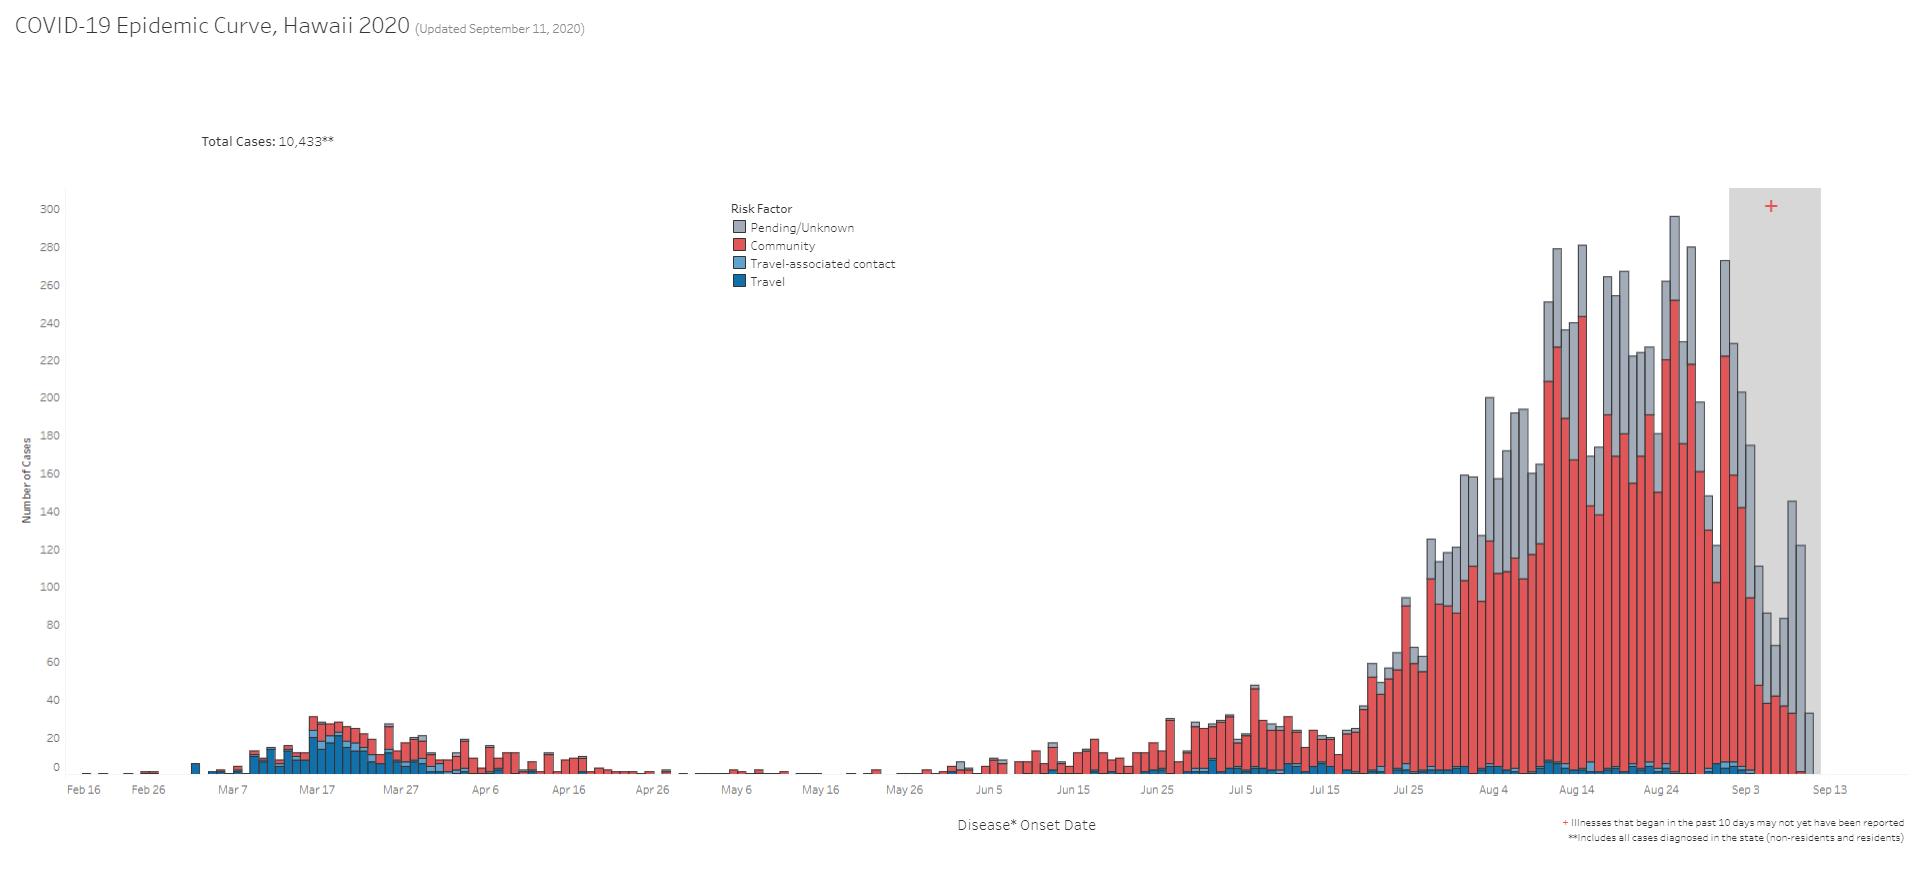 COVID-19 Epidemic Curve Hawaii September 11, 2020